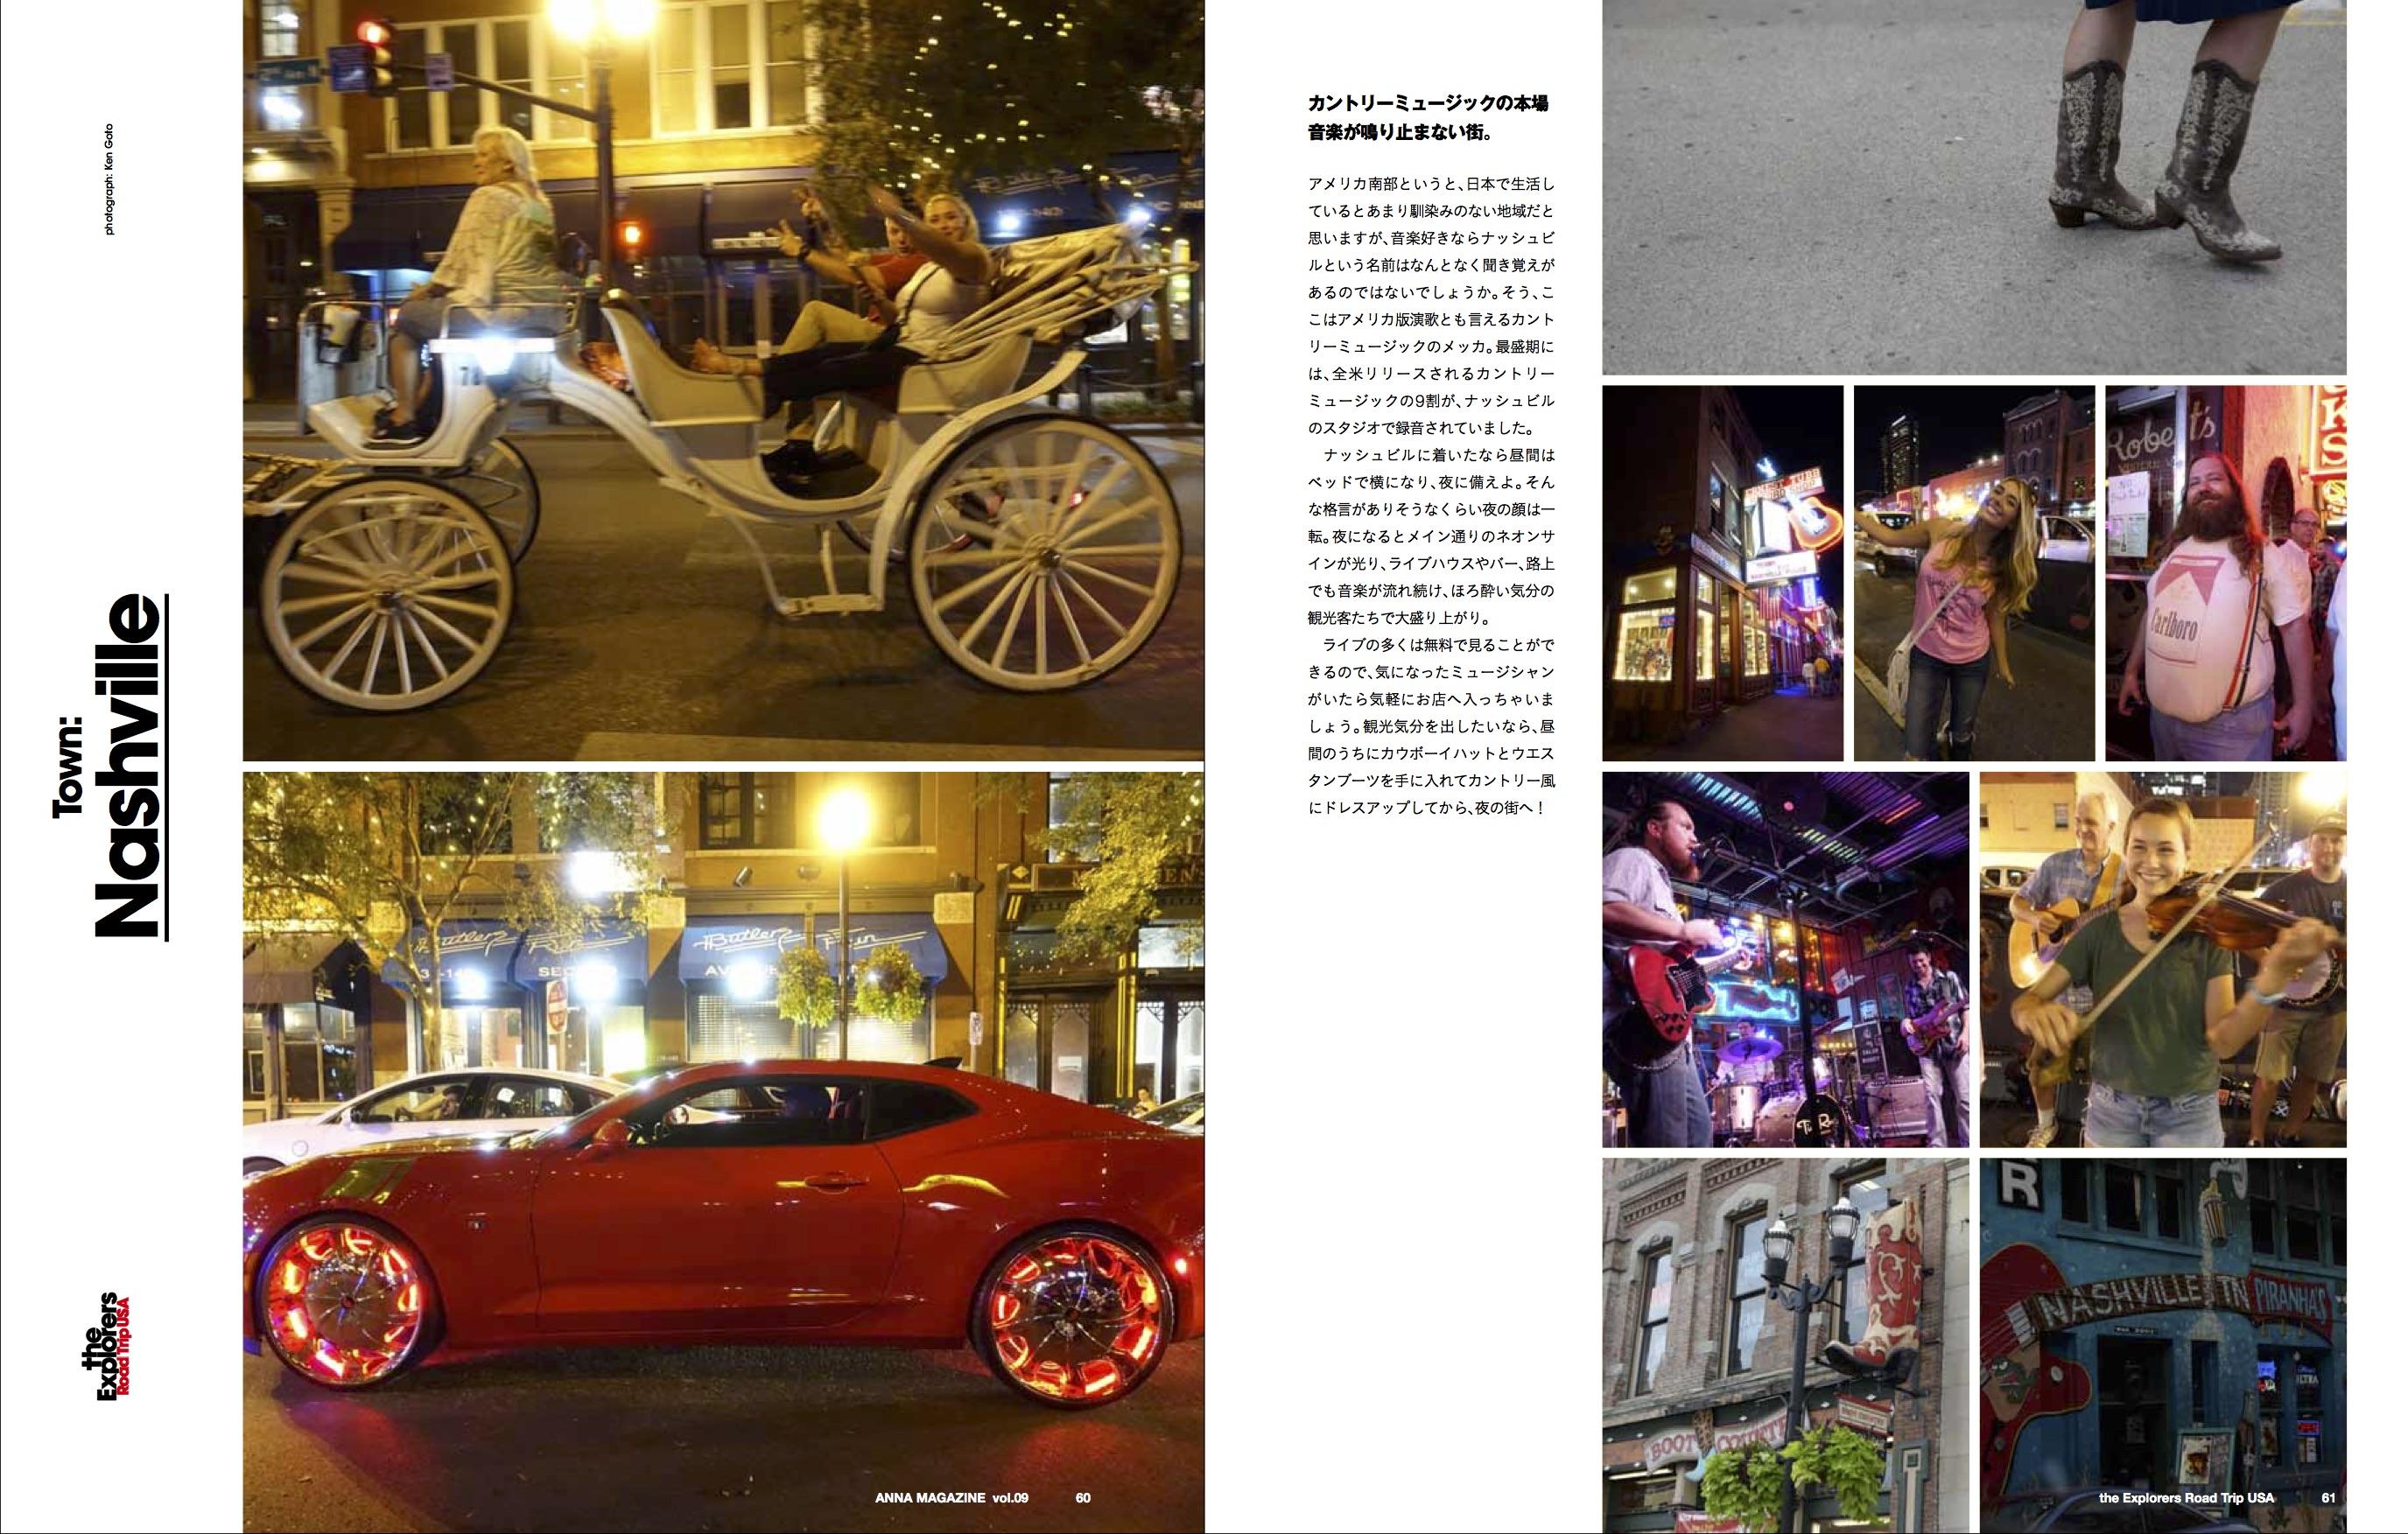 anna magazine vol.9 P30